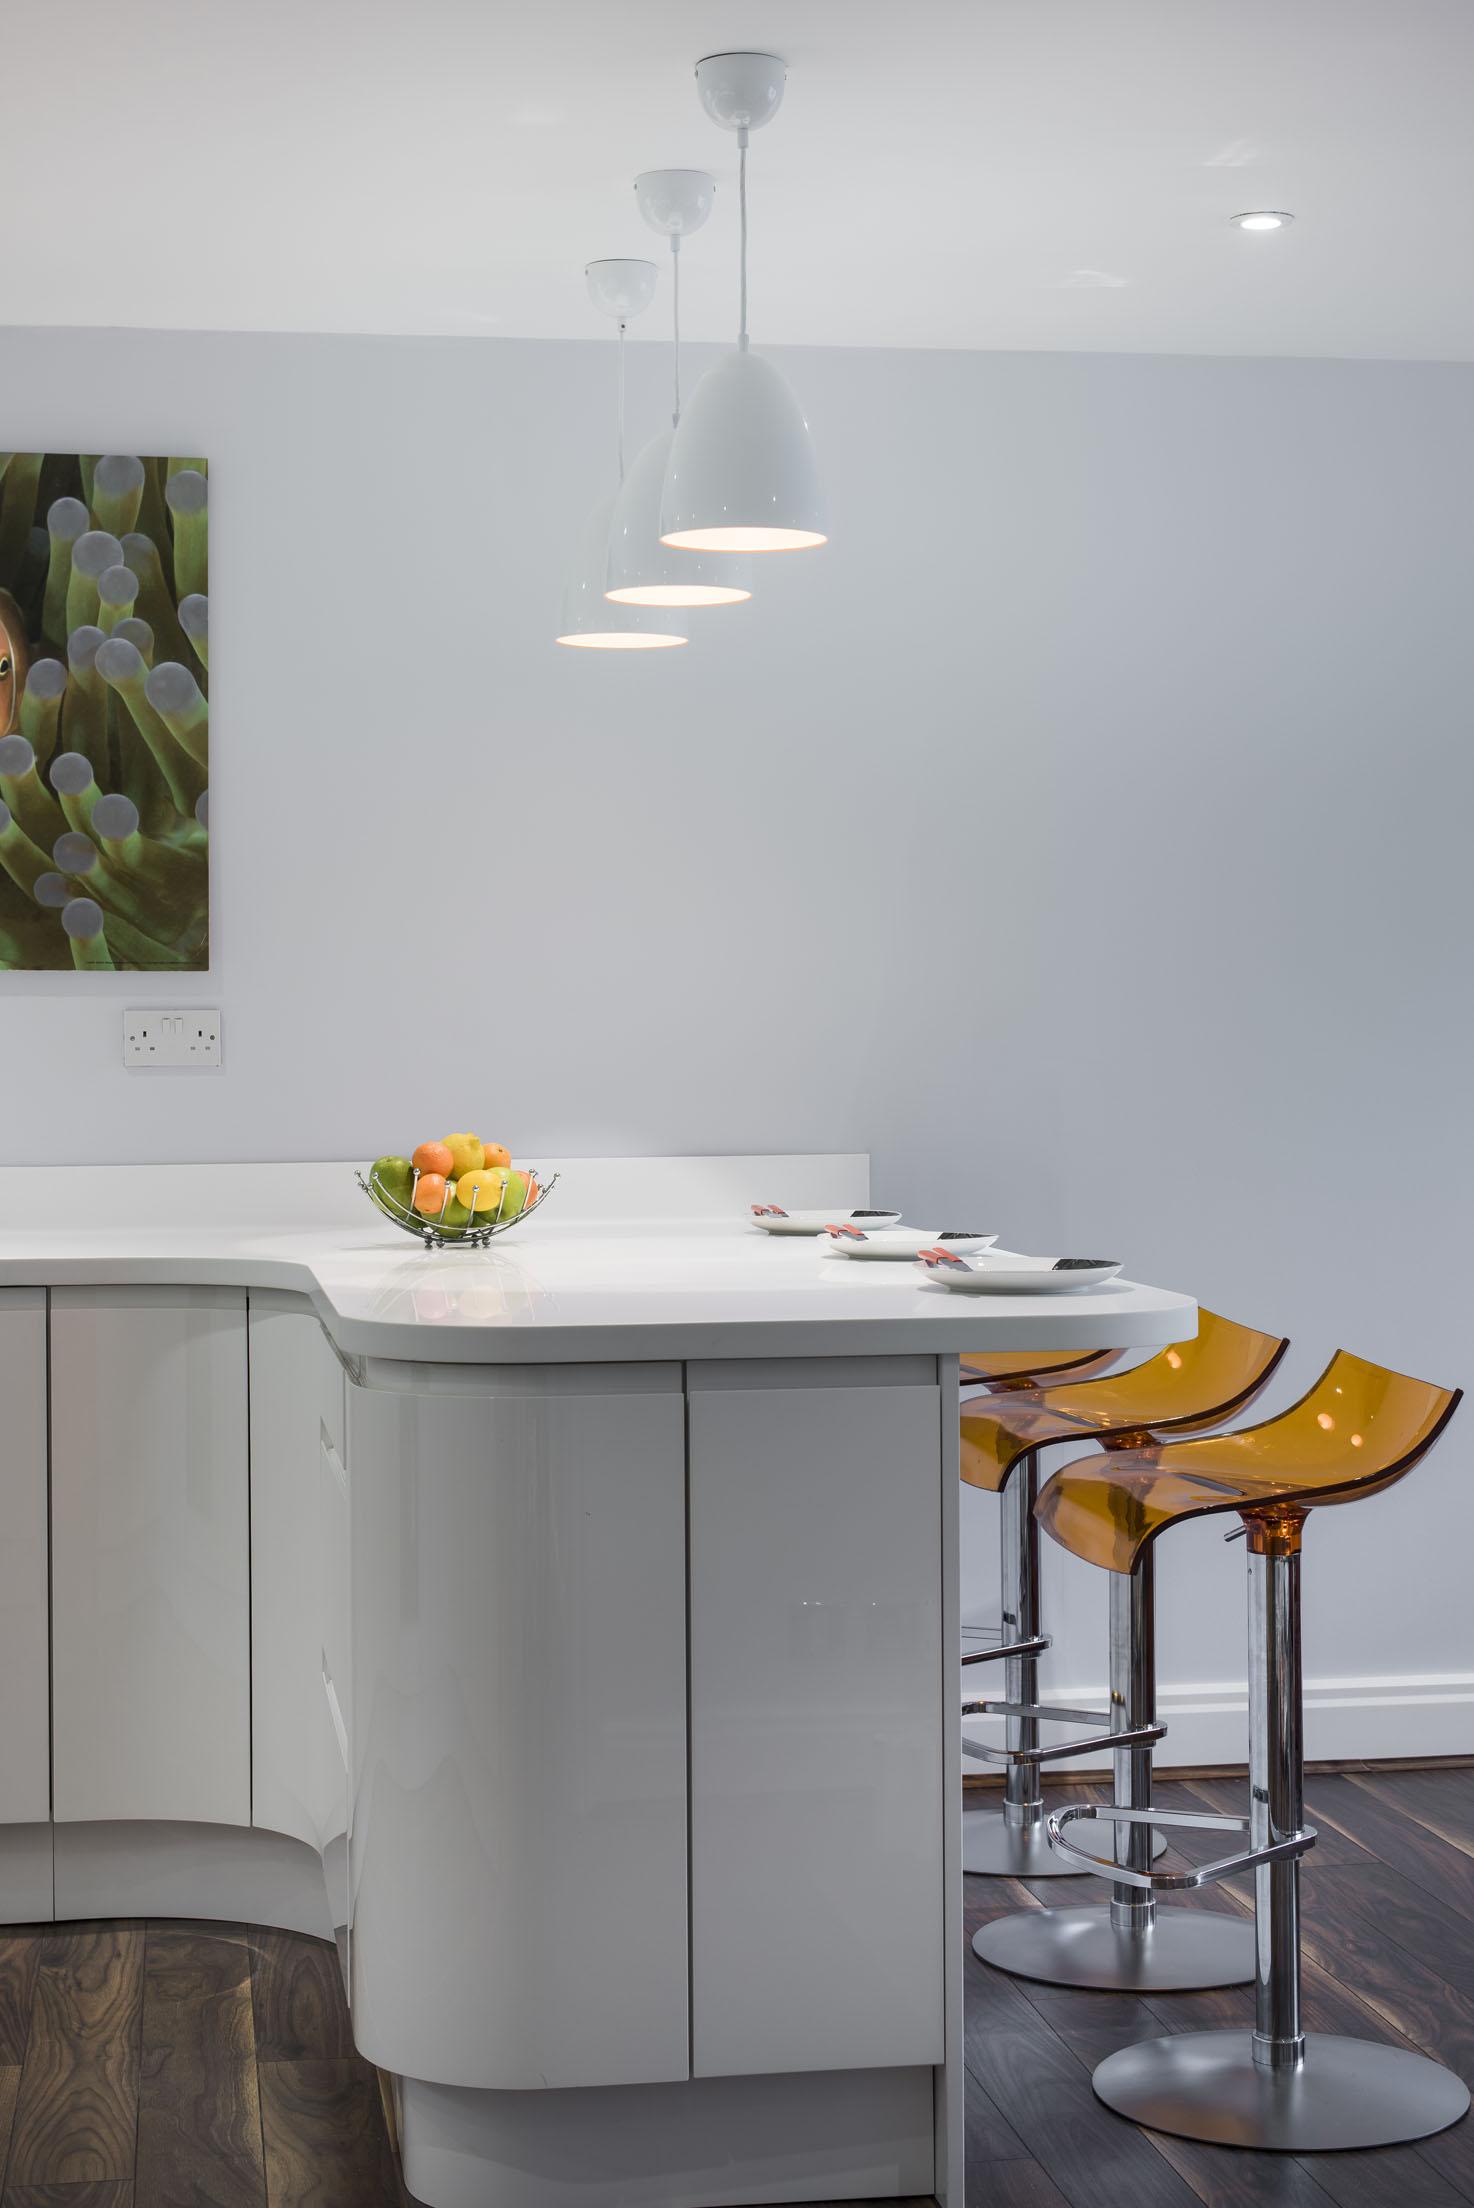 Wandsworth Kitchen by Kuche & Bagno